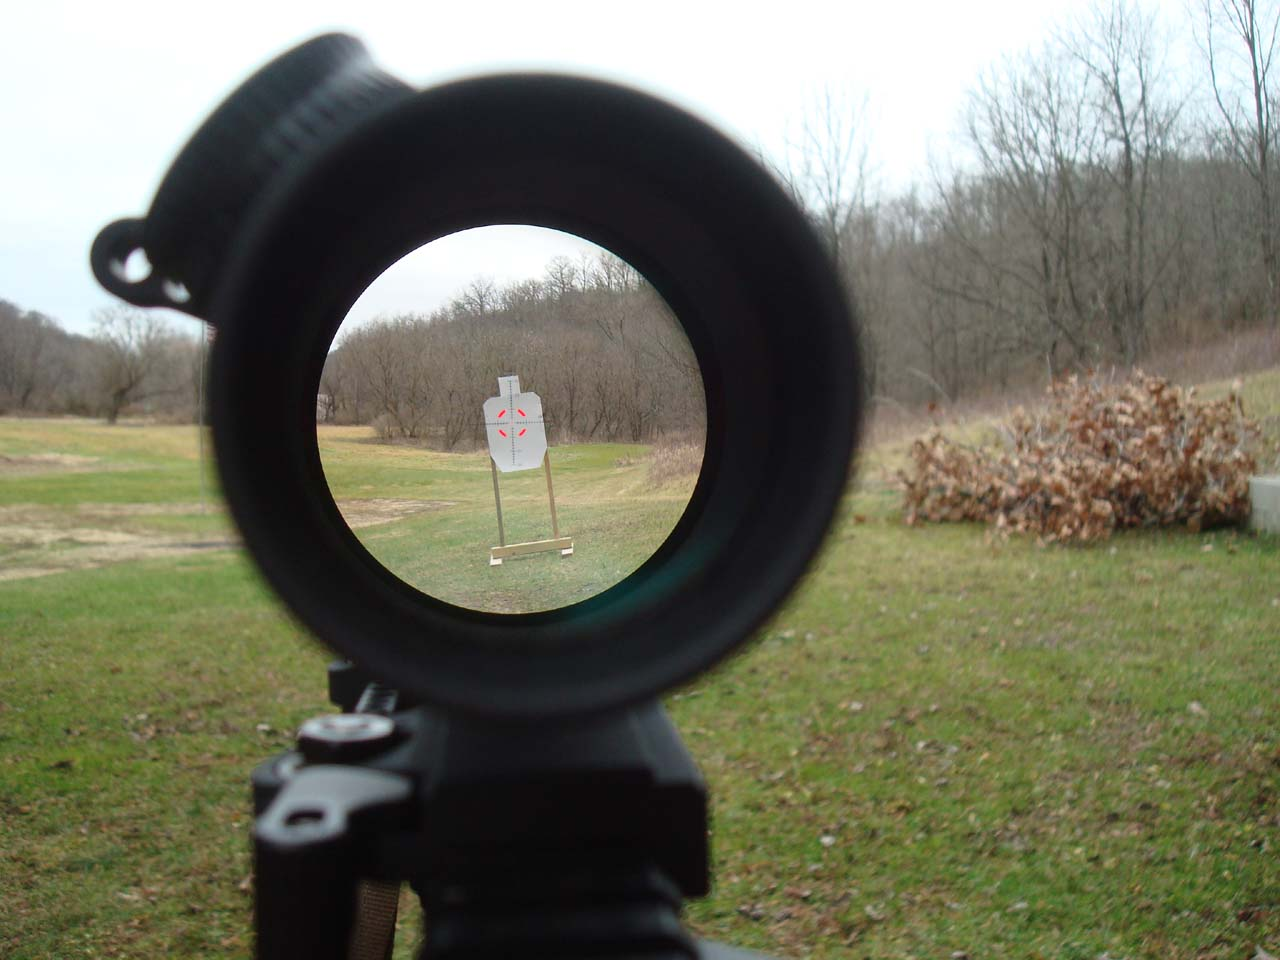 Training To Win Vortex Viper Hs 1 4x24 Optic